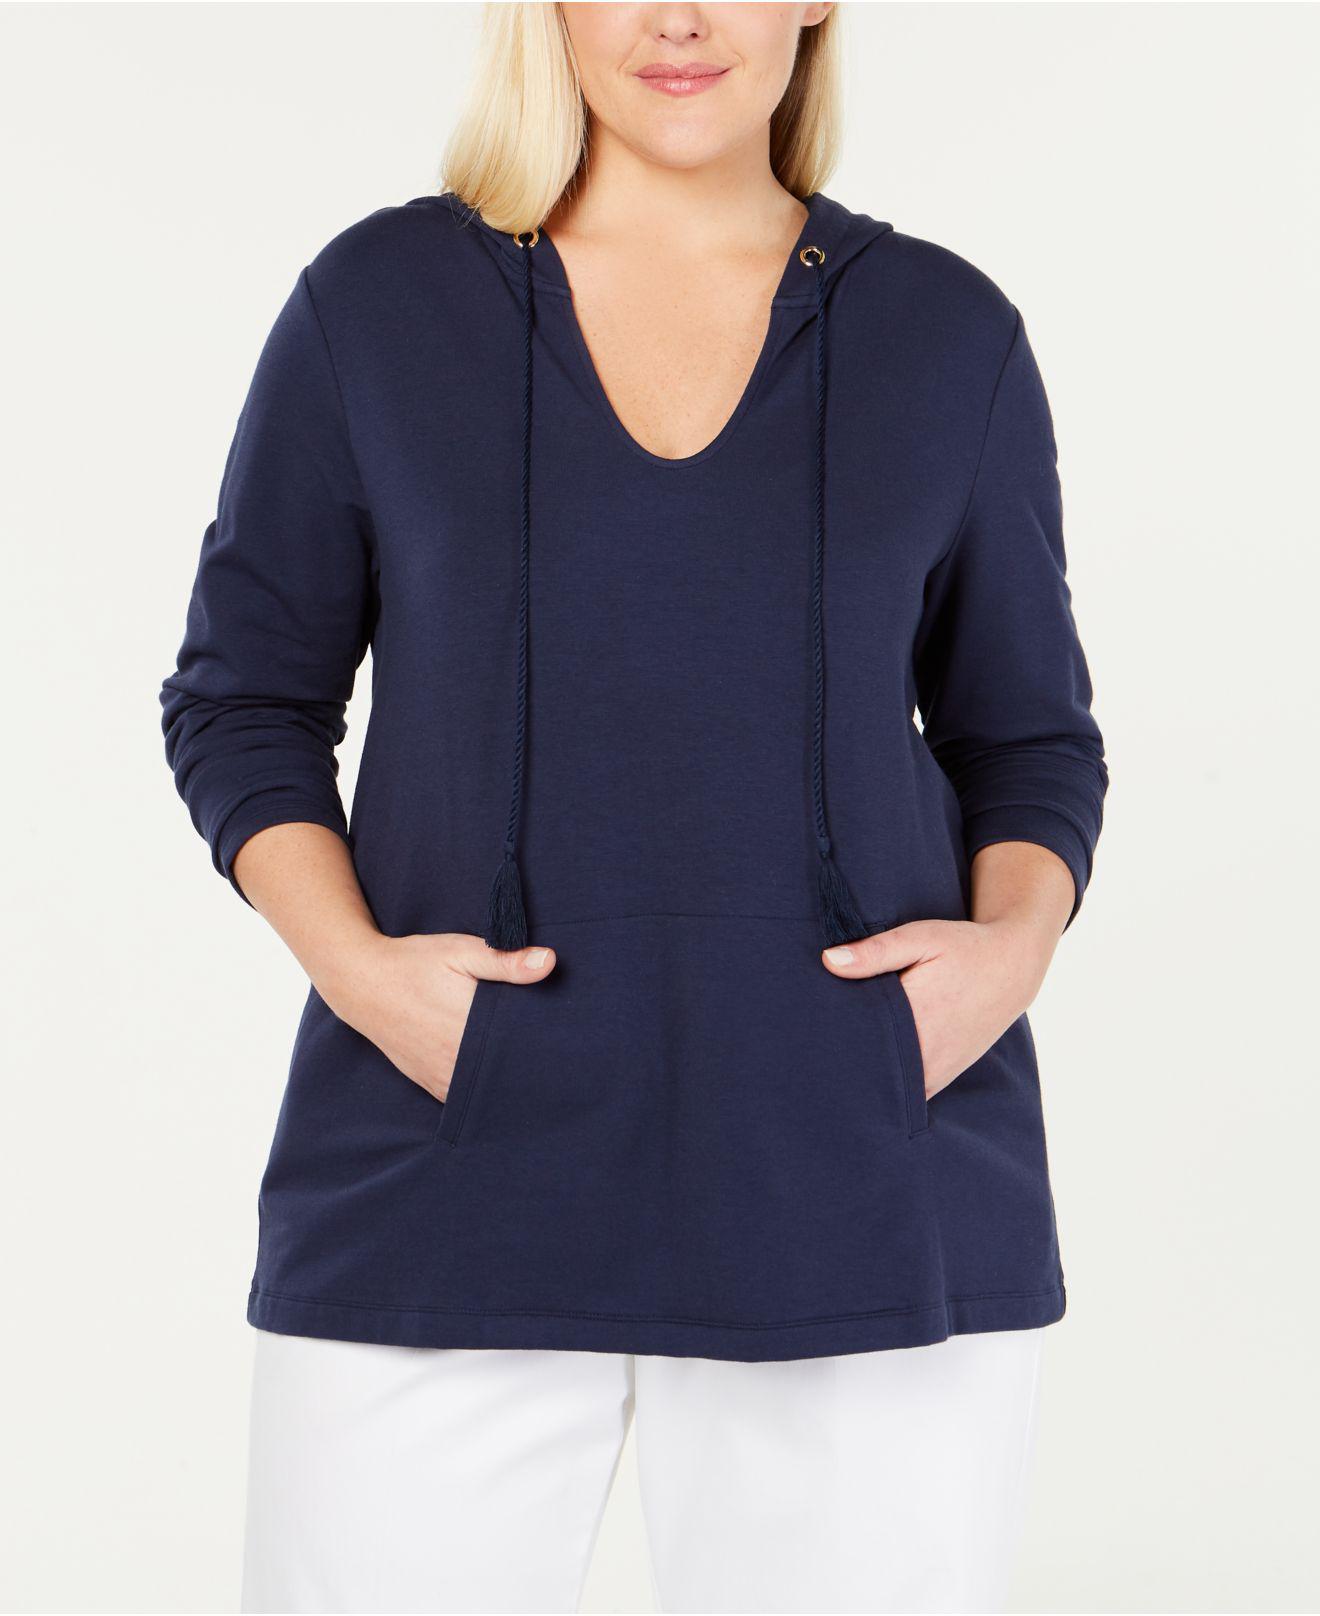 19ffbb33987 Charter Club. Women s Blue Plus Size Hoodie ...